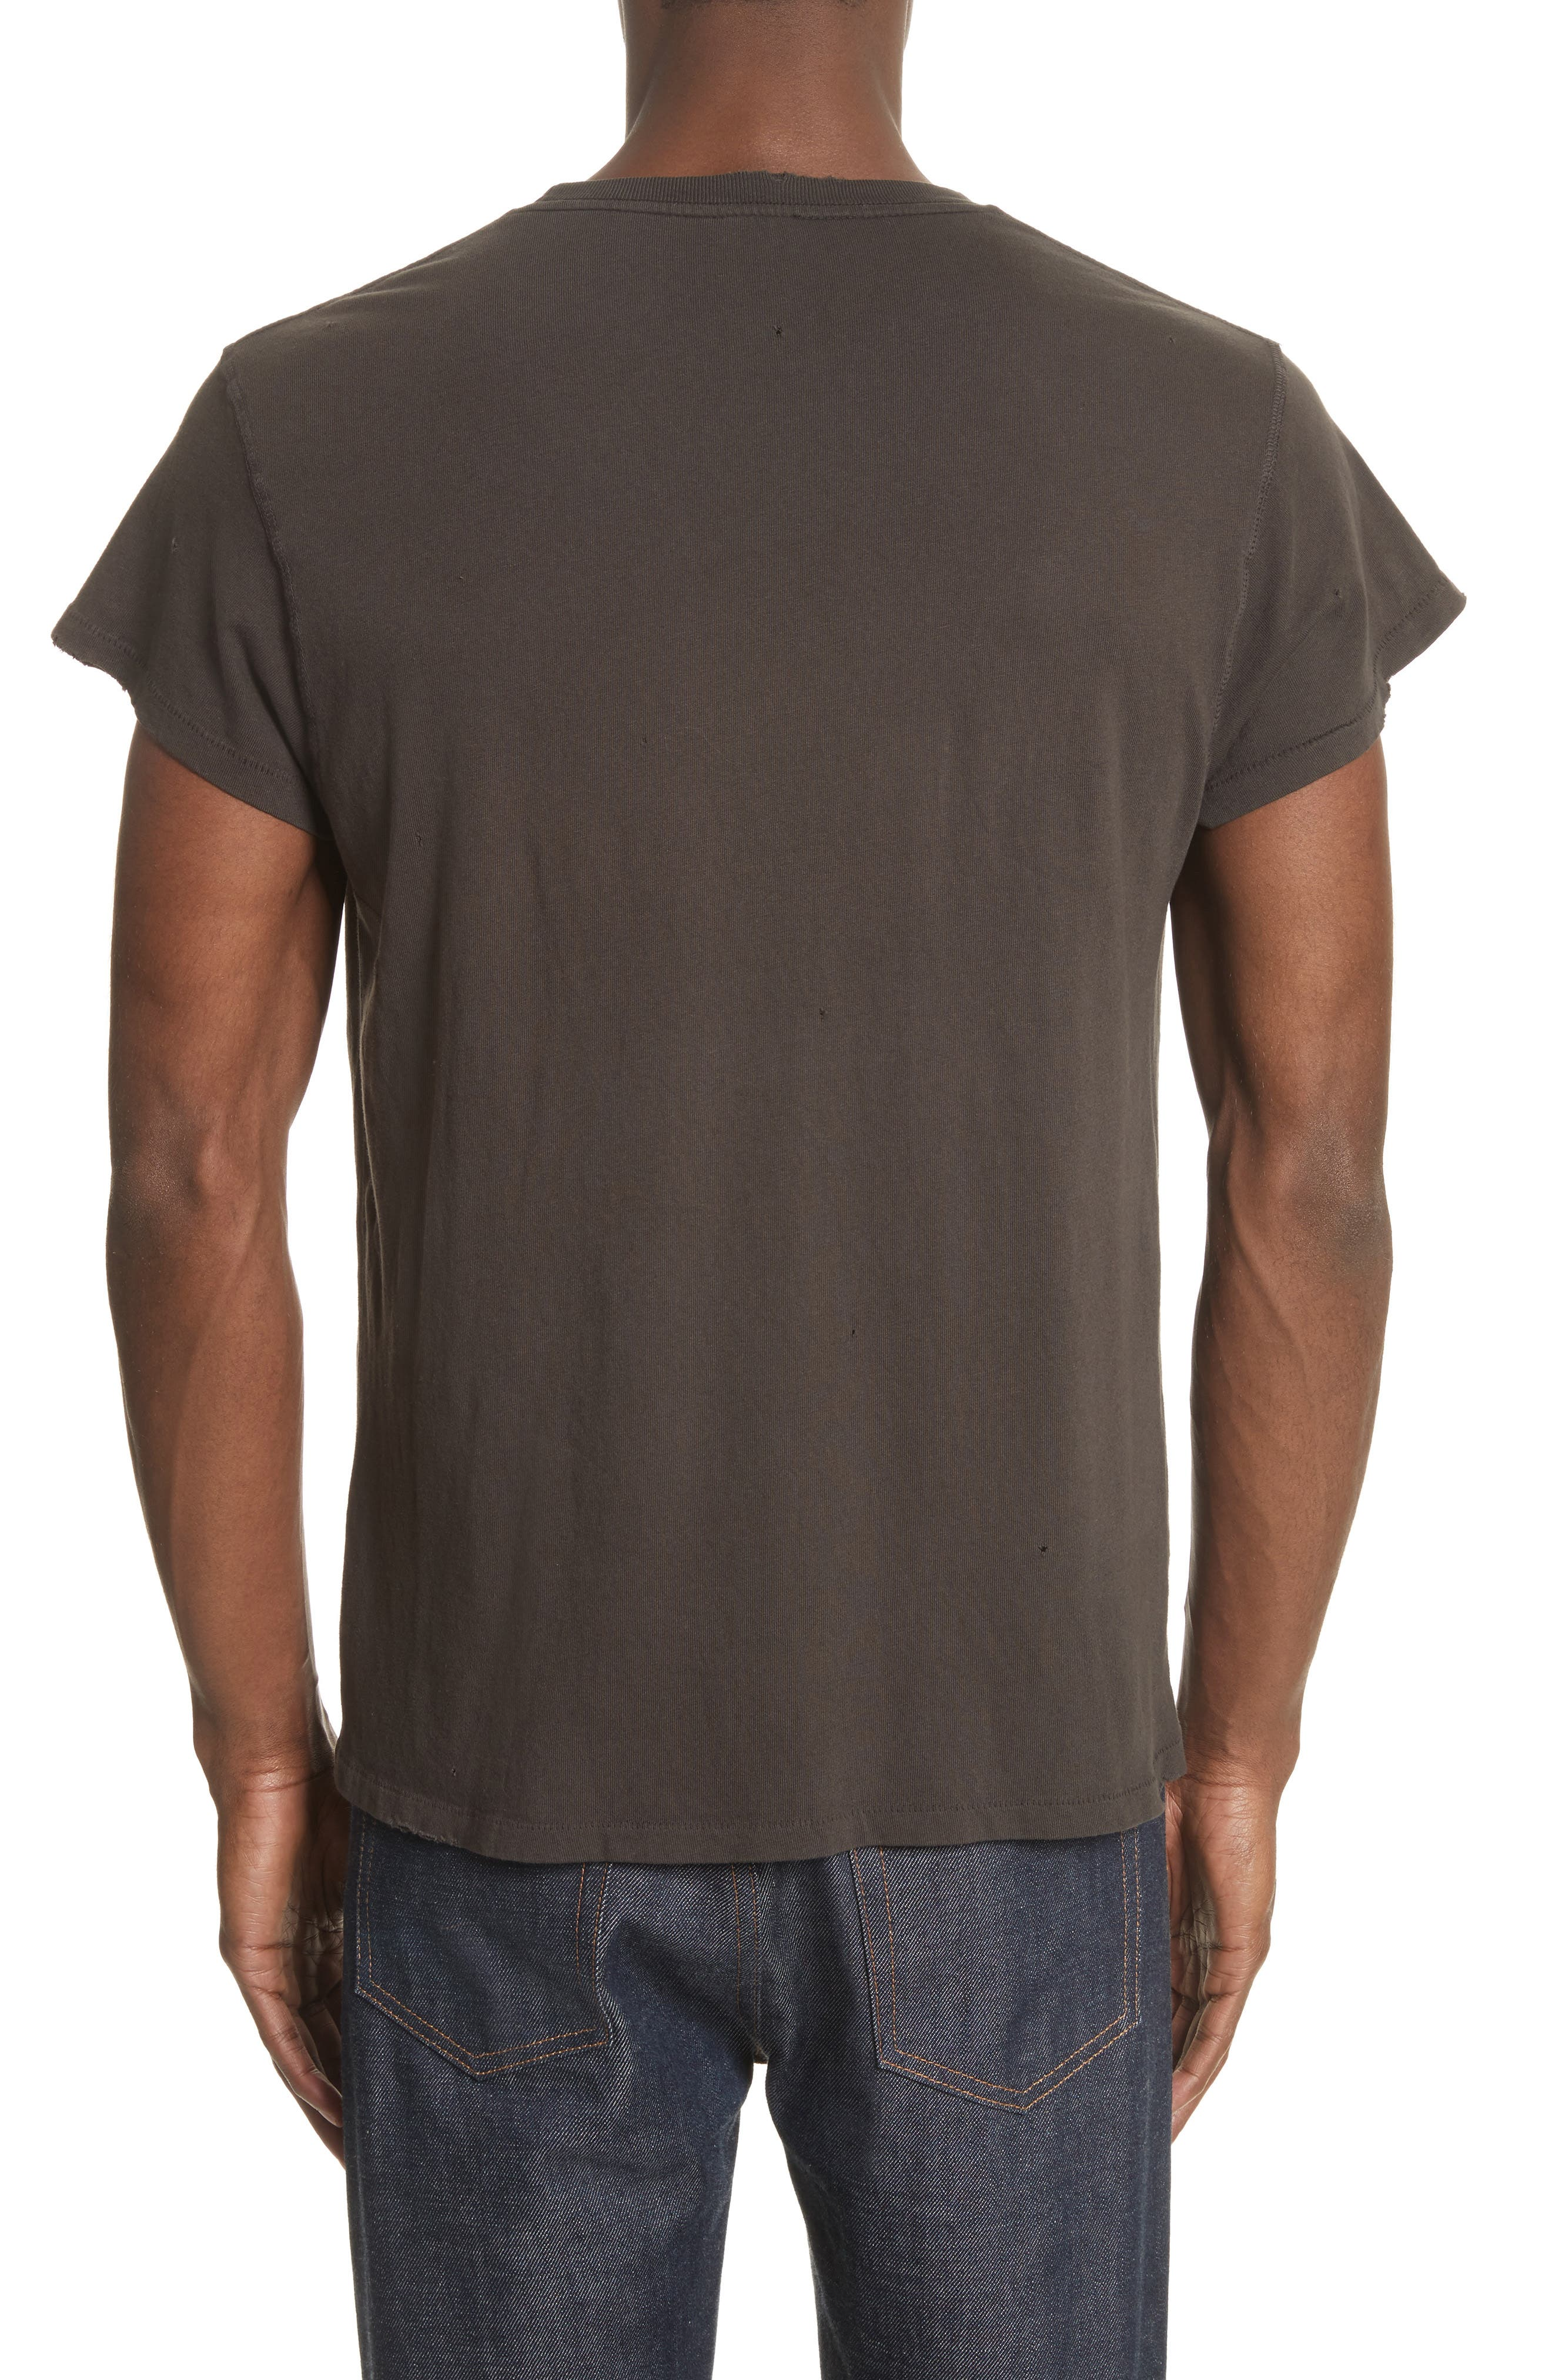 Notorious B.I.G. Graphic T-Shirt,                             Alternate thumbnail 2, color,                             001